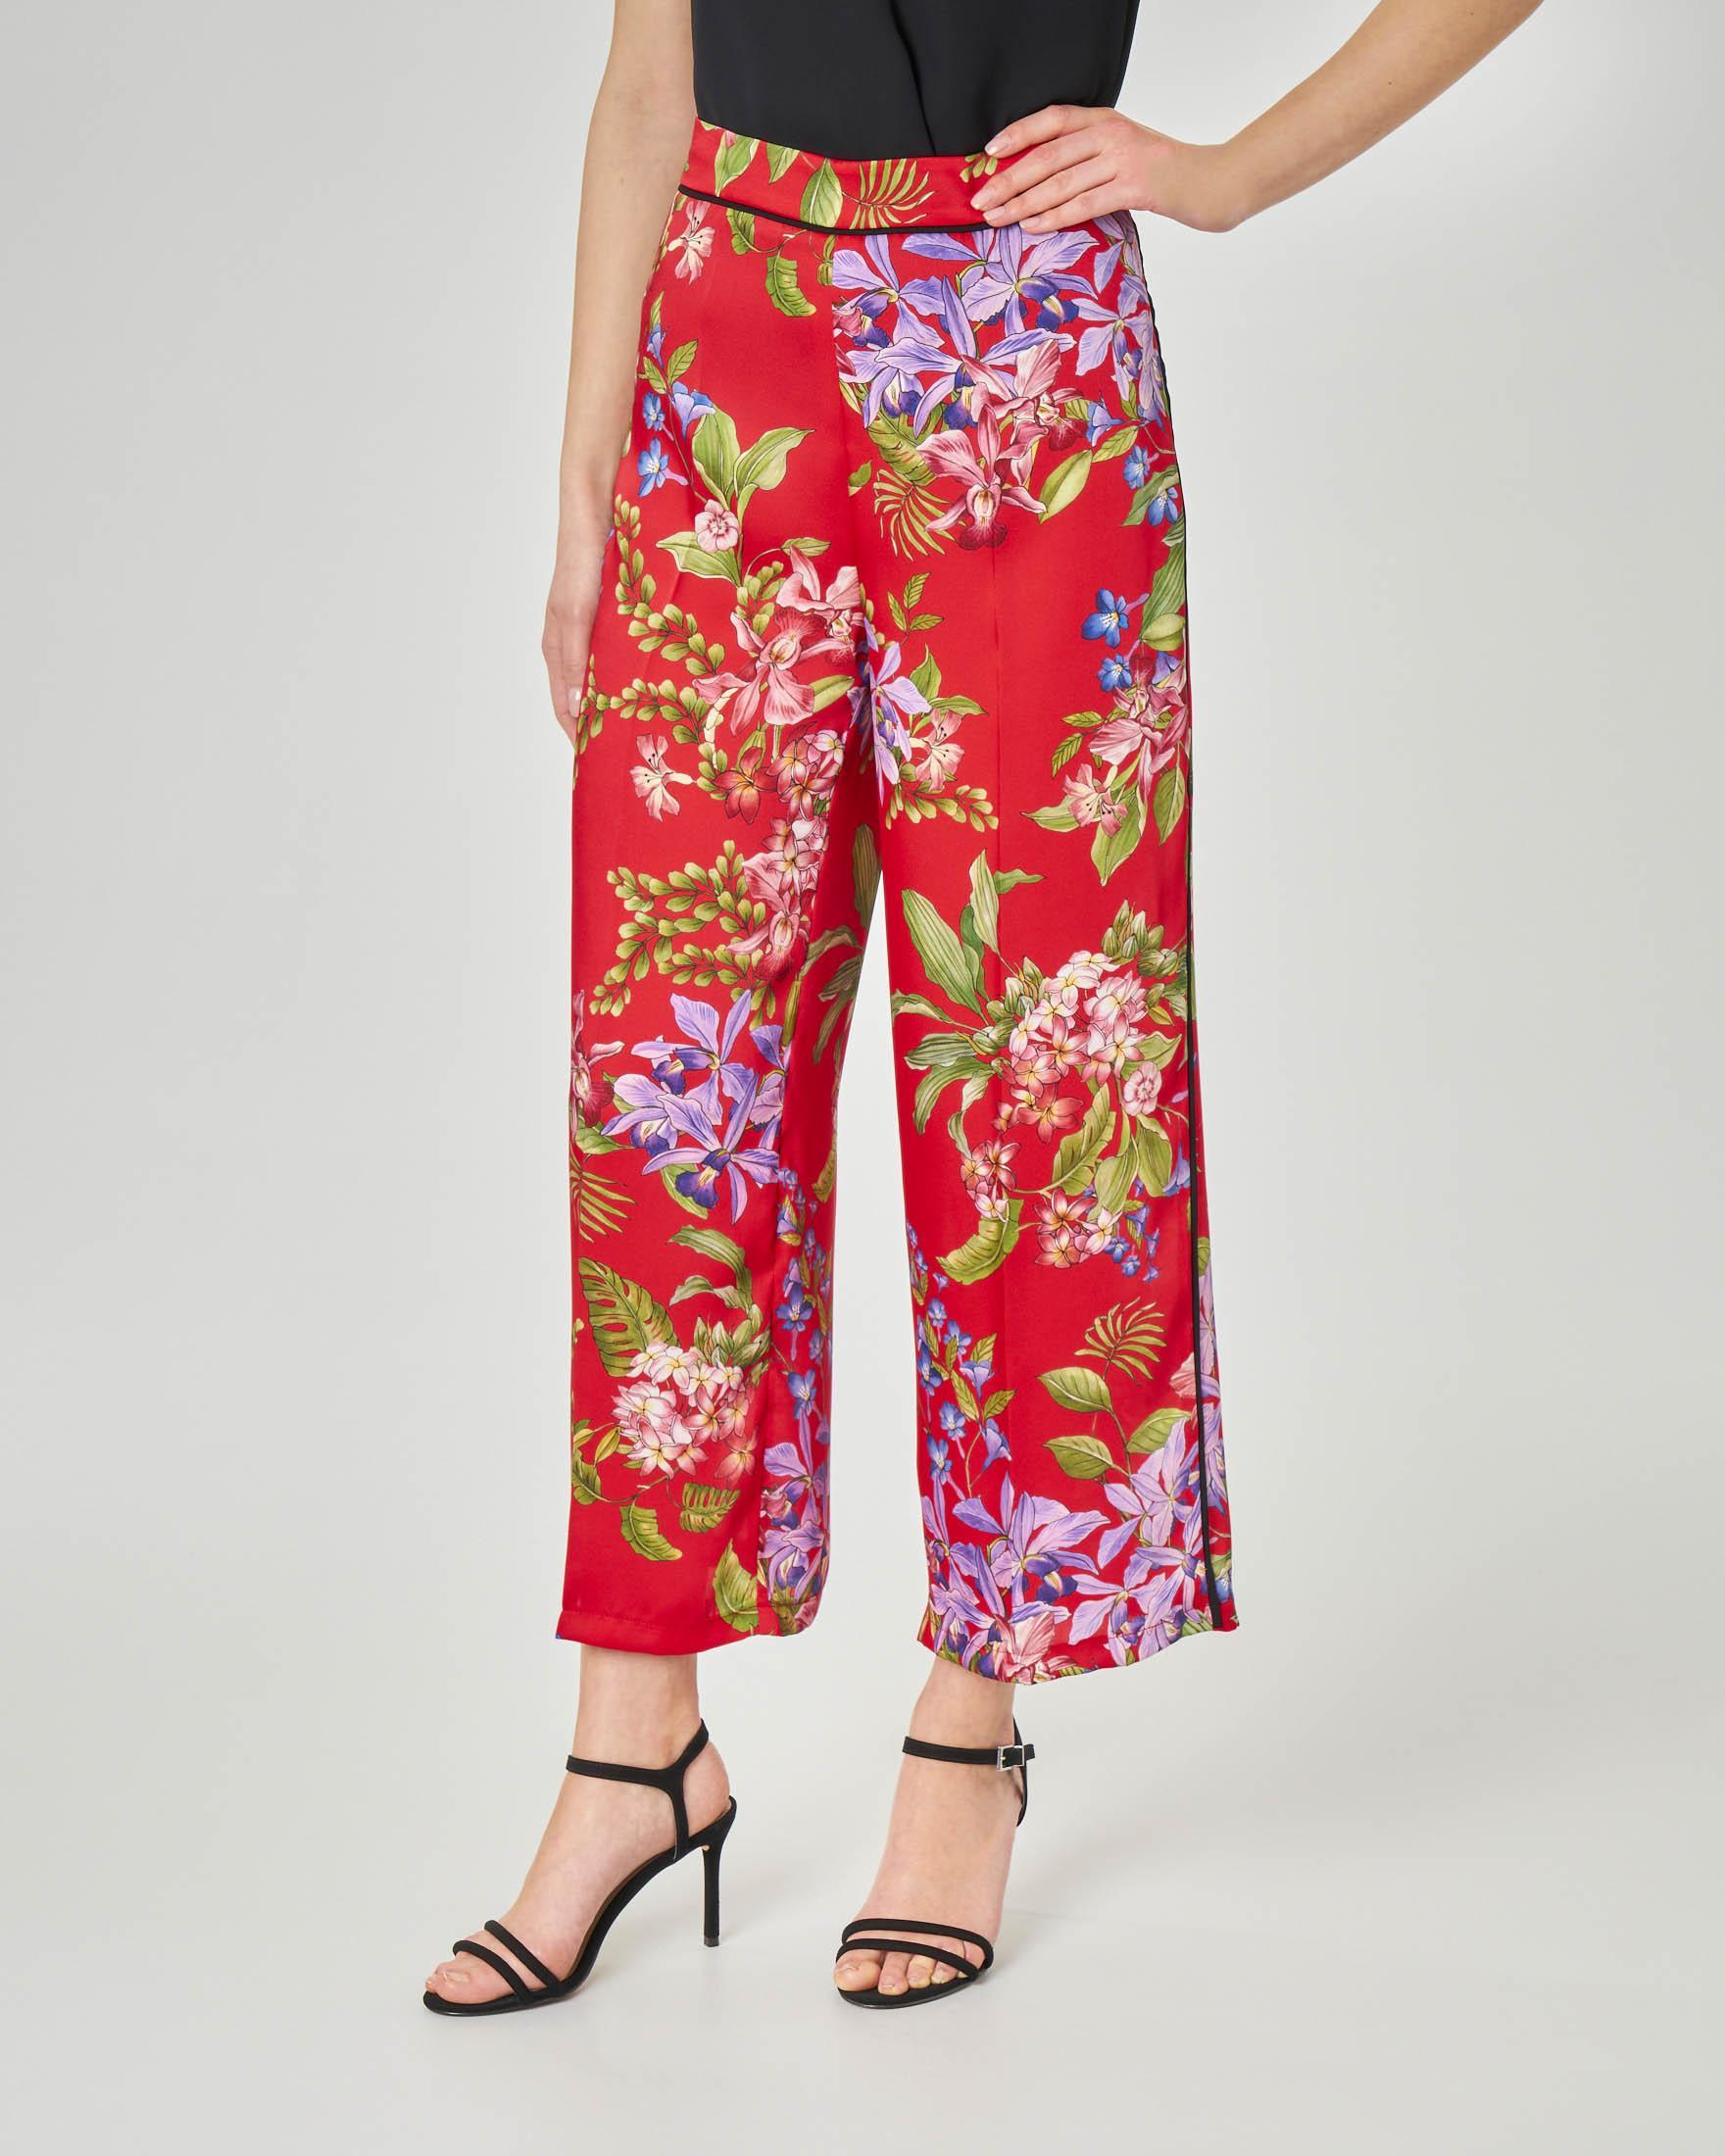 Pantaloni culotte rossi in tessuto effetto raso a fantasia floreale